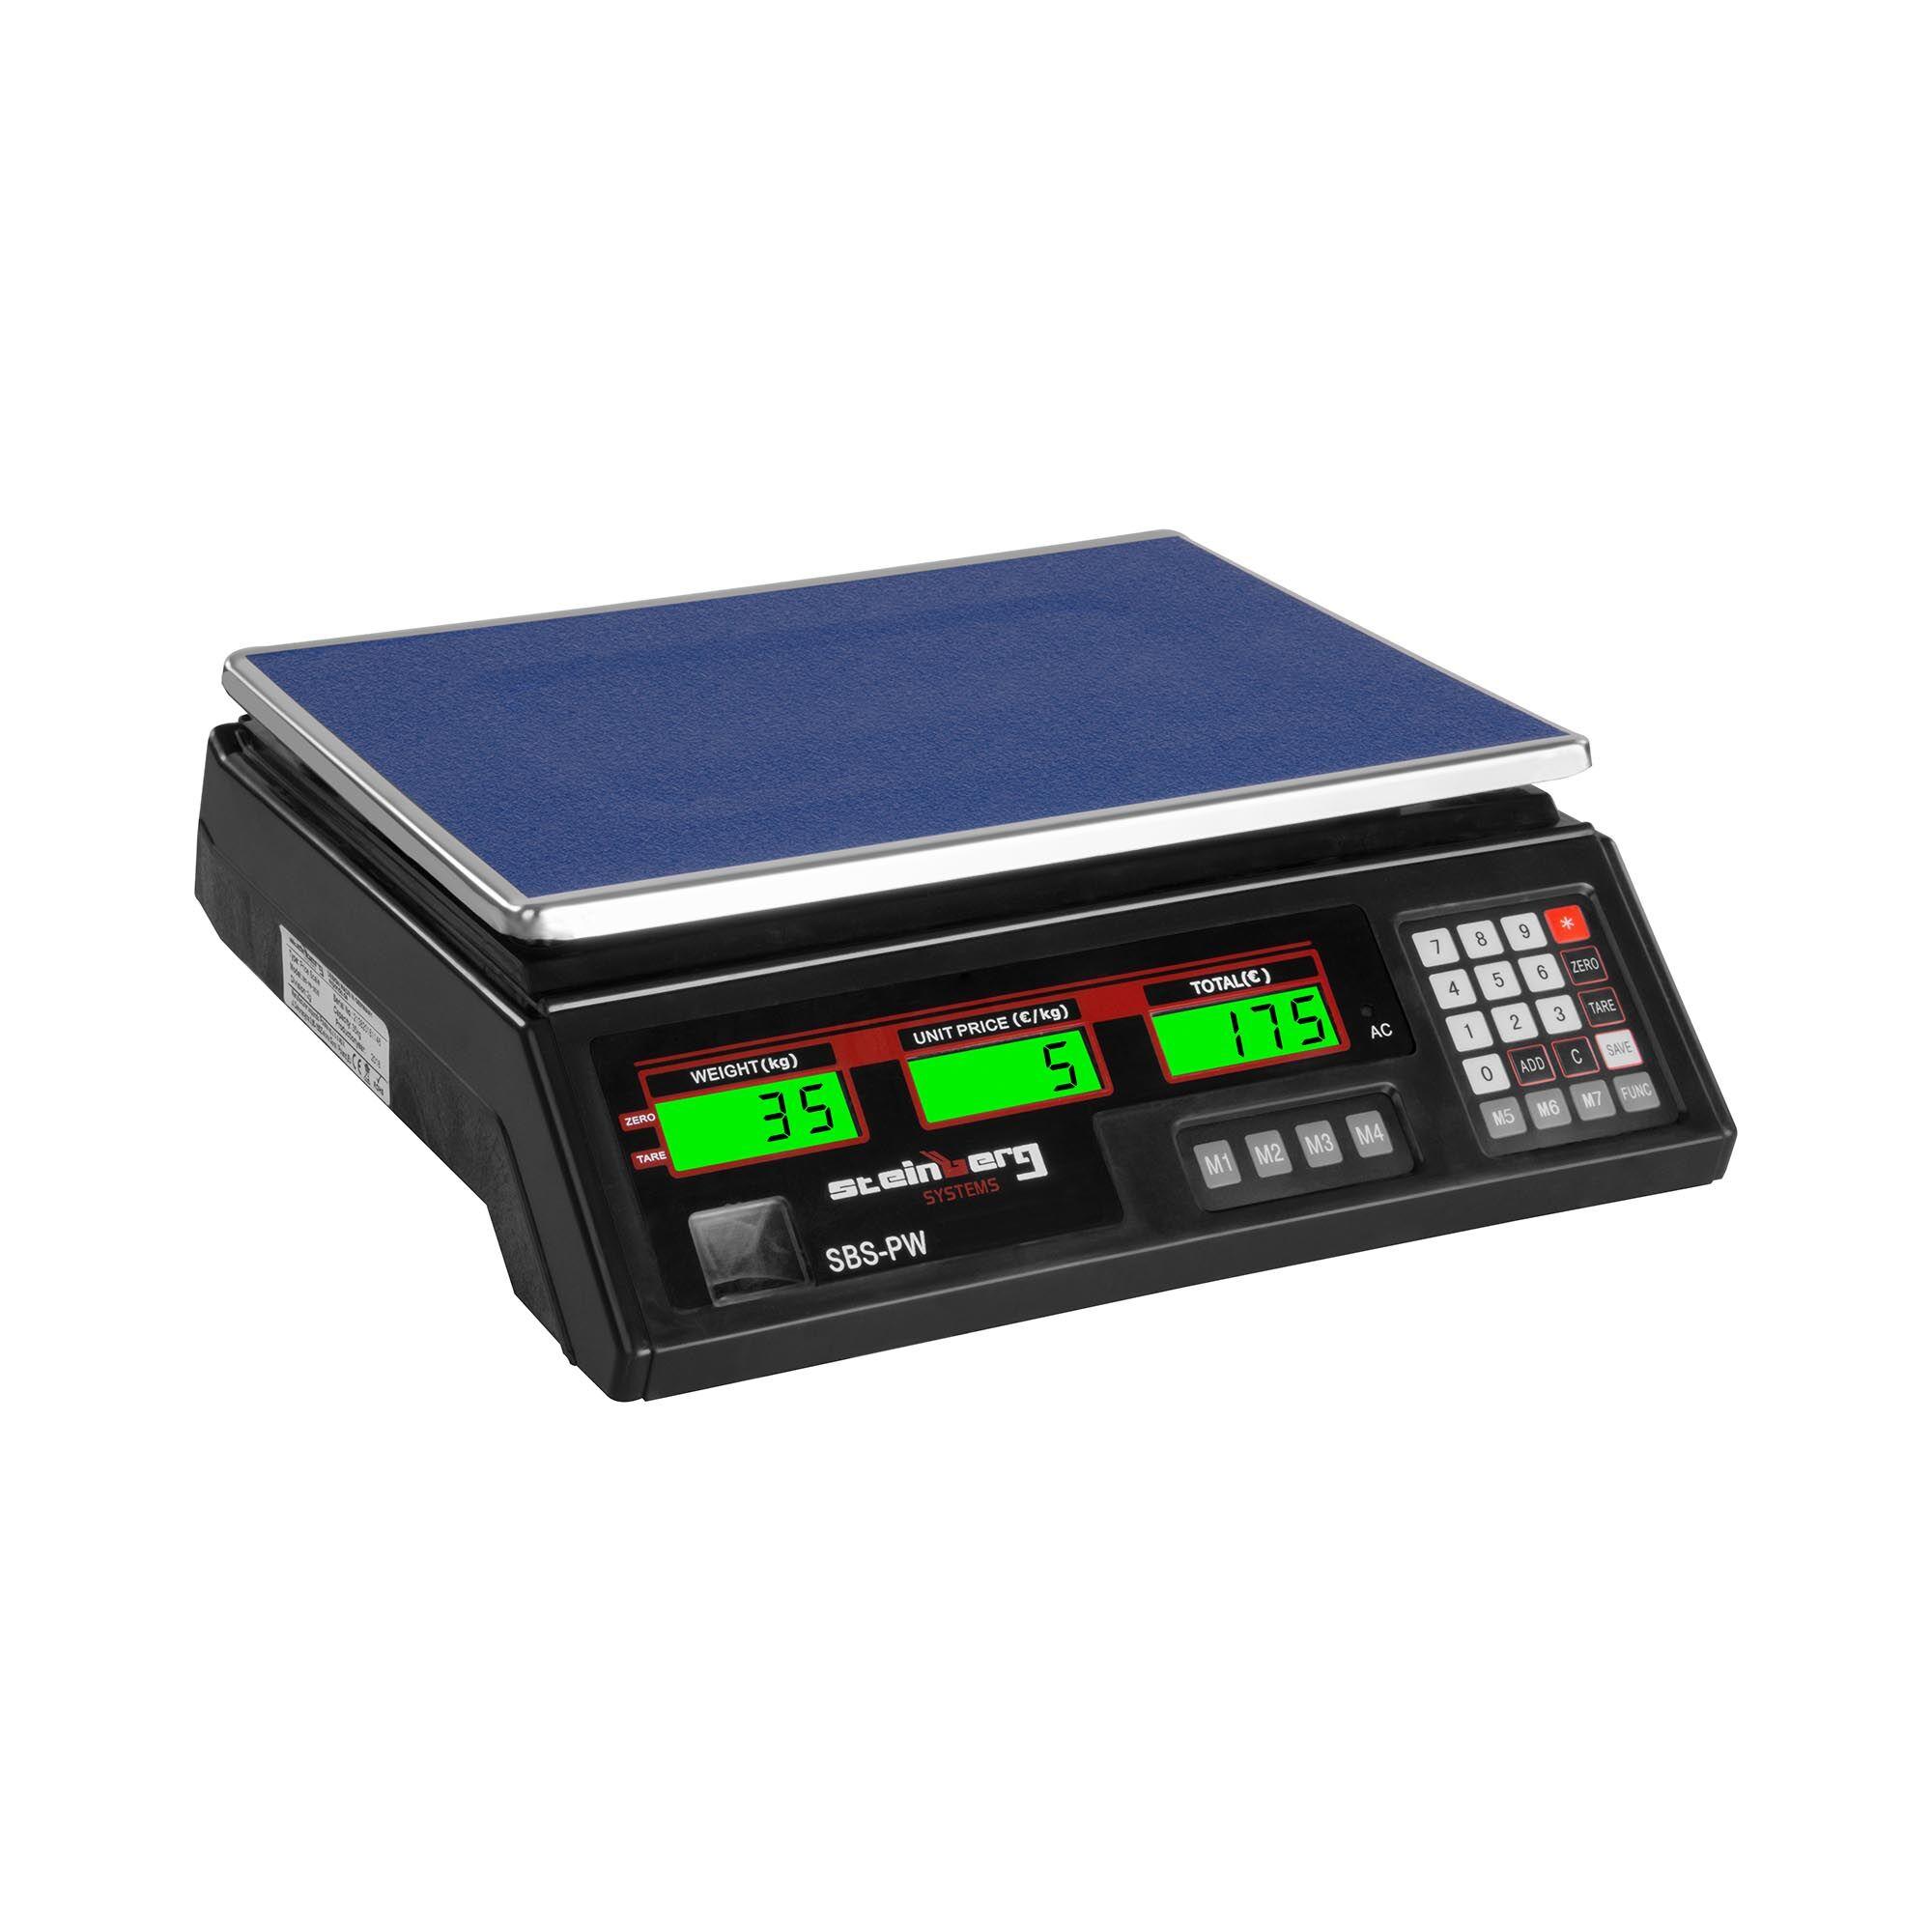 Steinberg Systems Balance poids-prix - 35 kg / 2 g - noire - LCD SBS-PW-352B